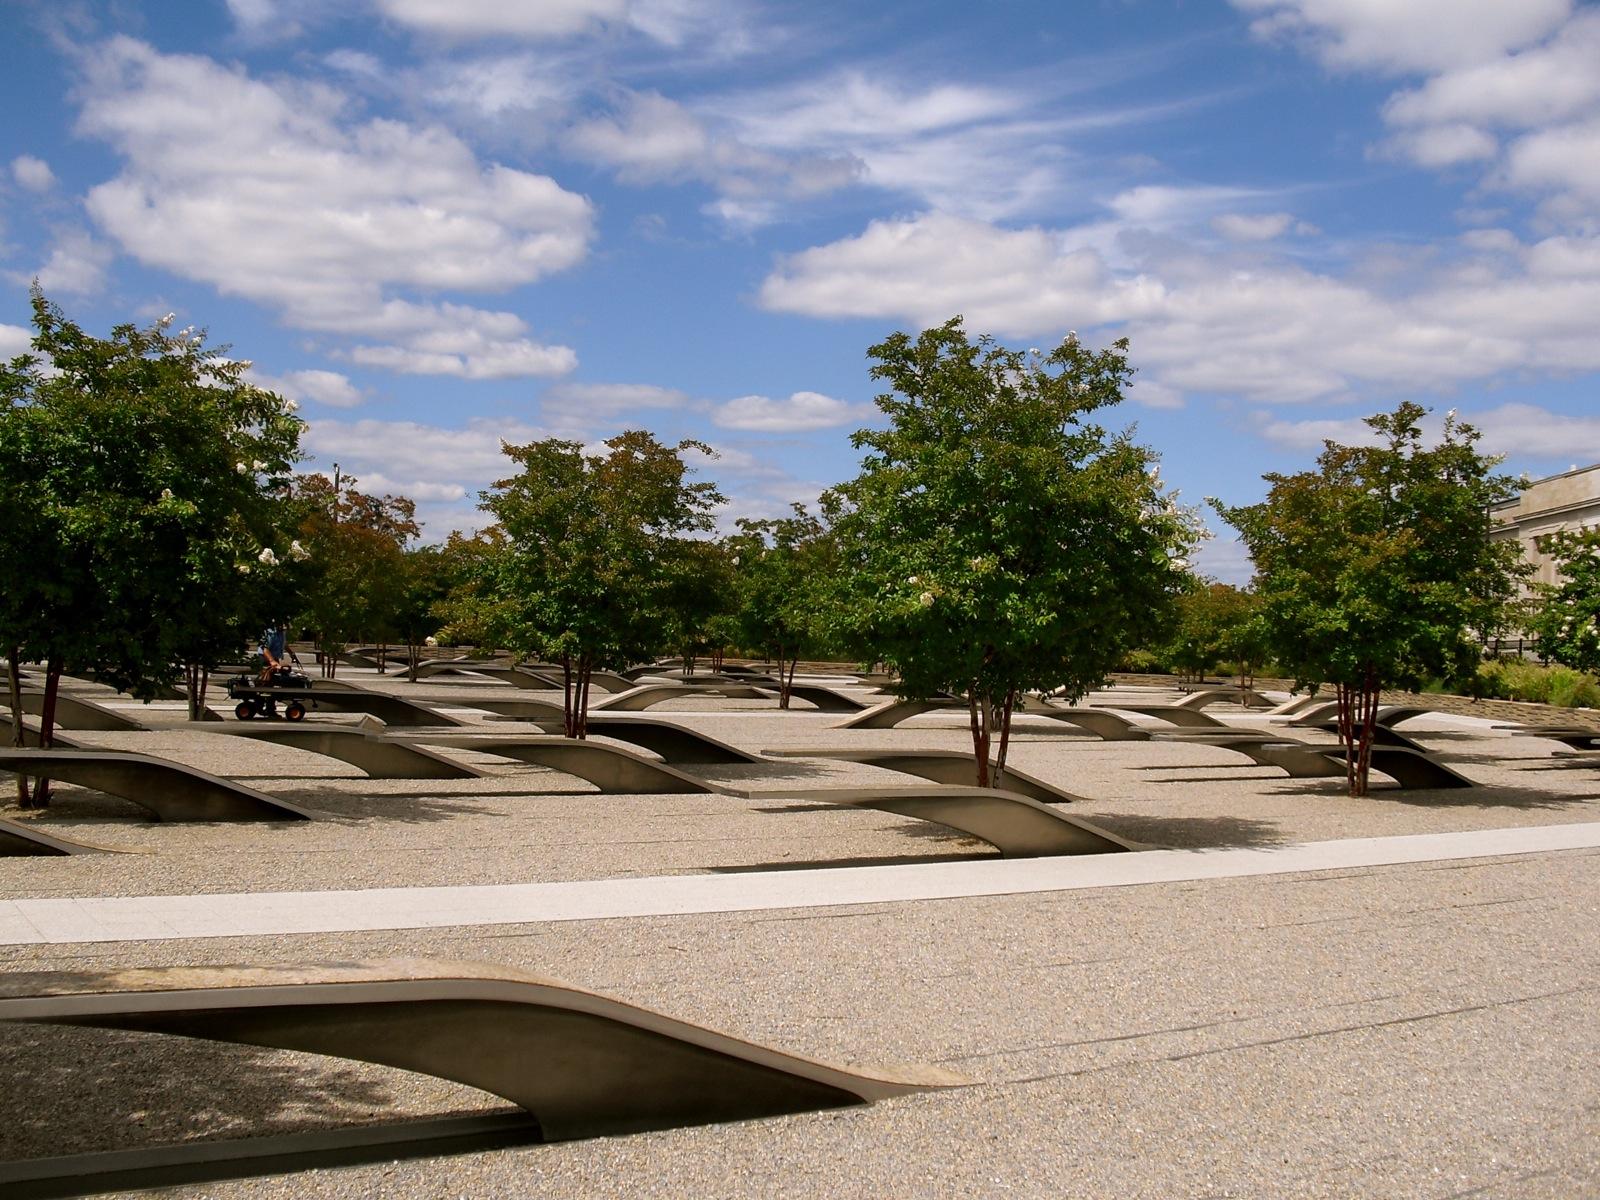 National-9-11-Pentagon-Memorial-Arlington-VA